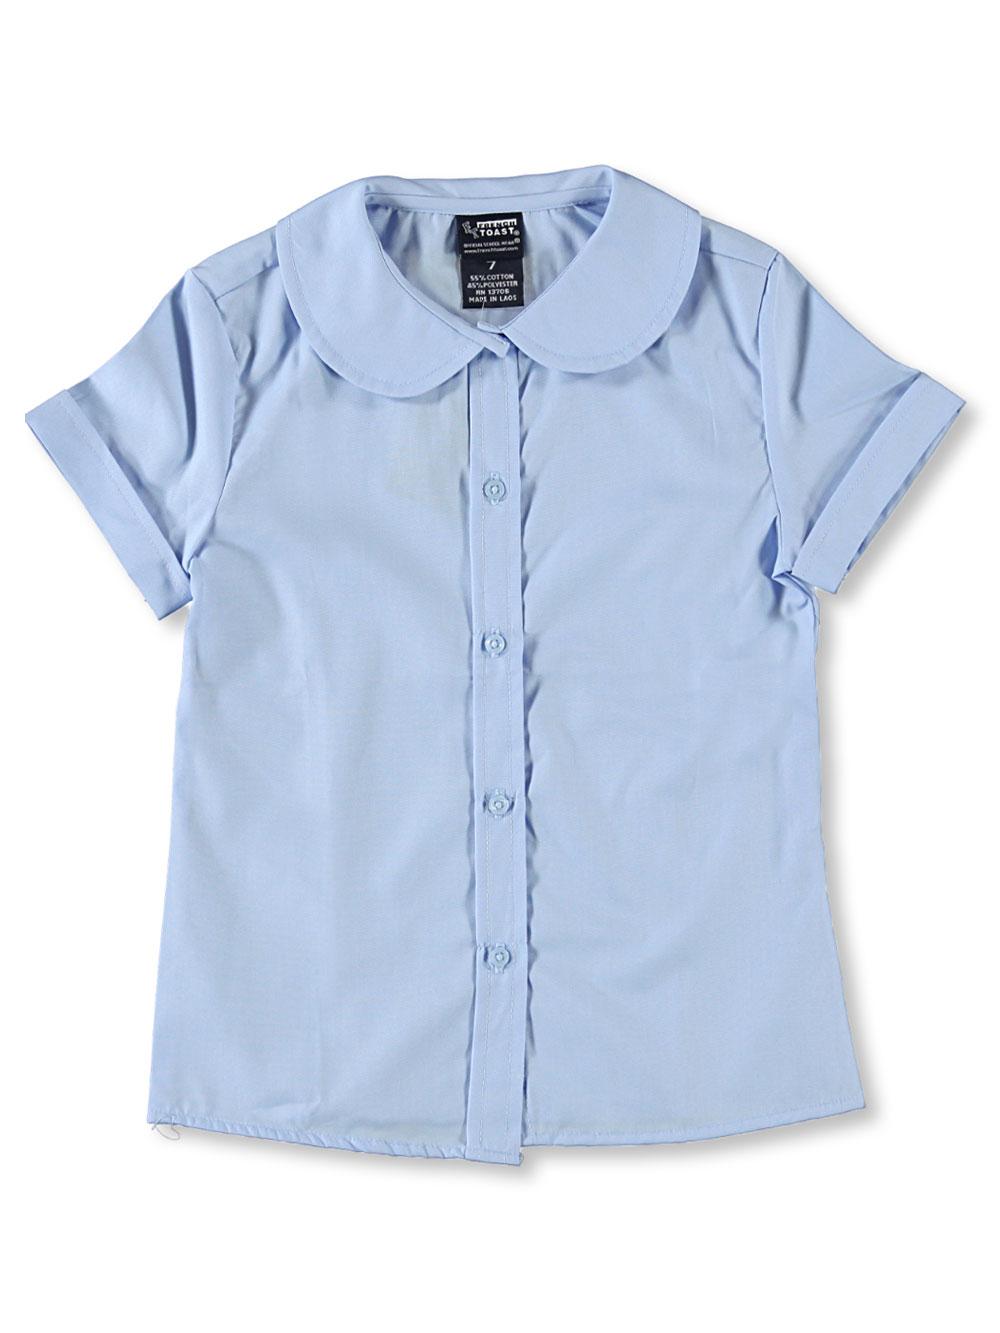 Toddler Boys French Toast Button Down Short Sleeve Dress//School Uniform Shirt